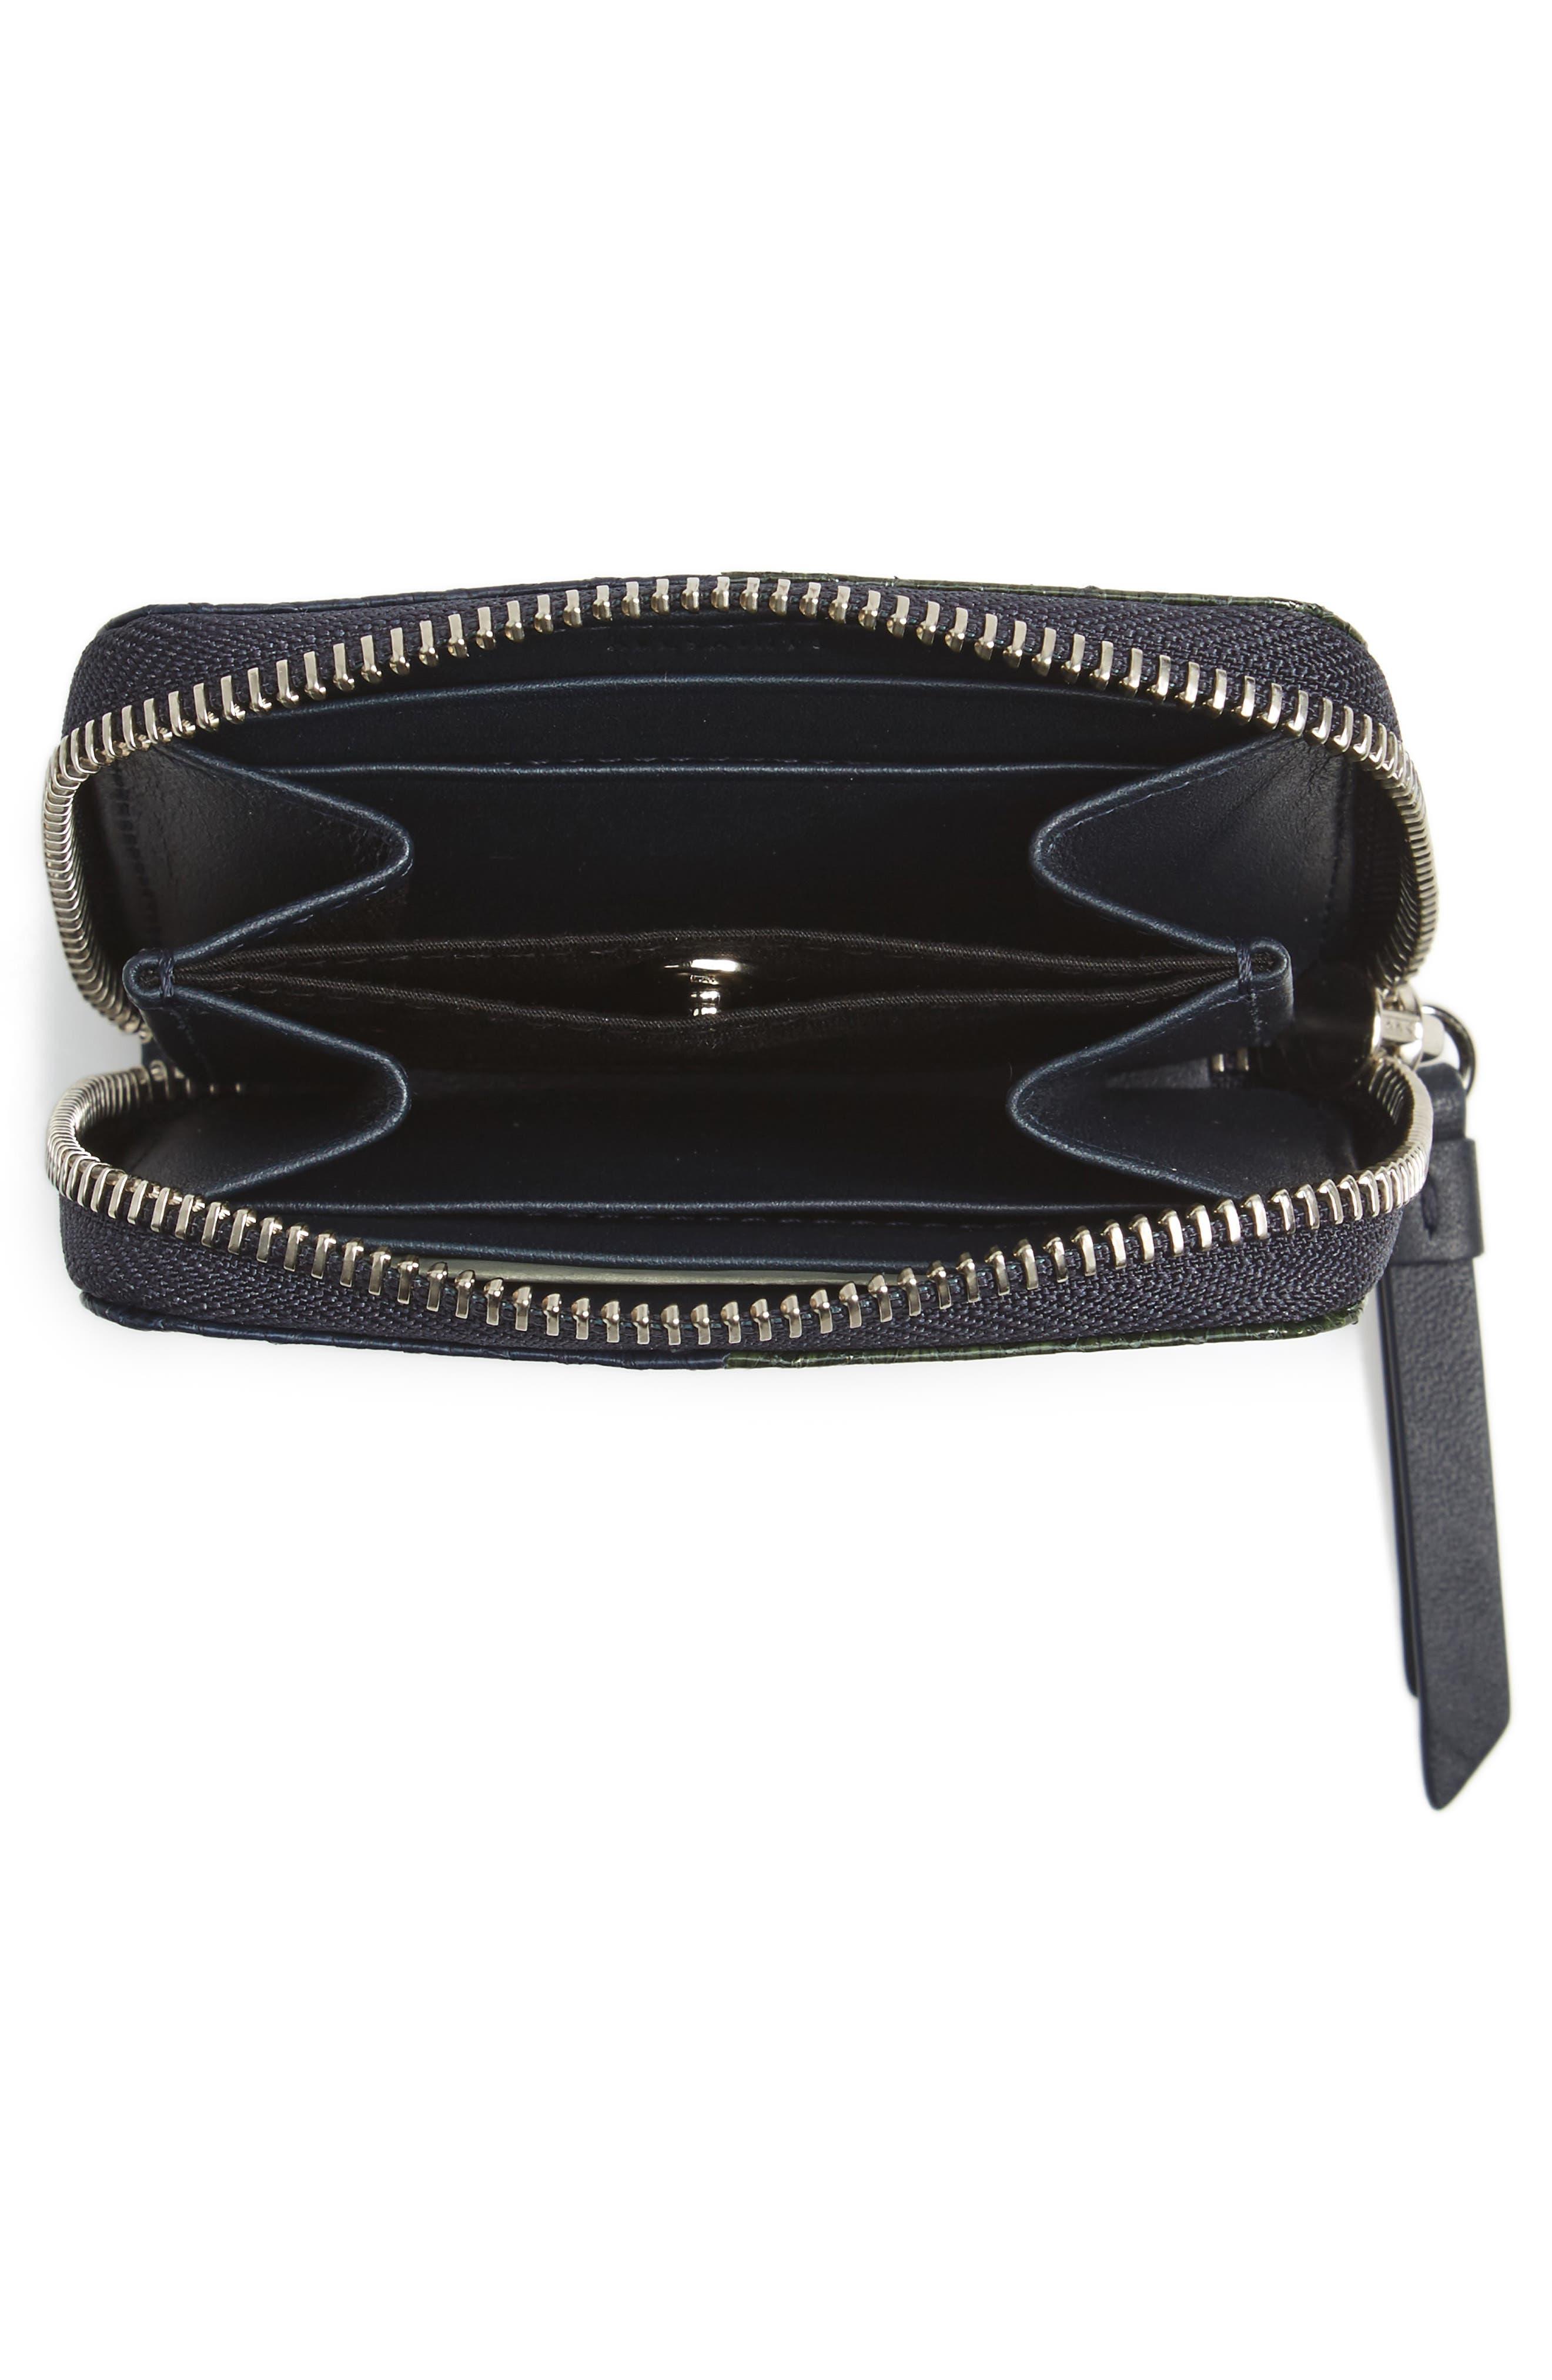 Ikuya Leather & Genuine Snakeskin Wallet,                             Alternate thumbnail 2, color,                             405